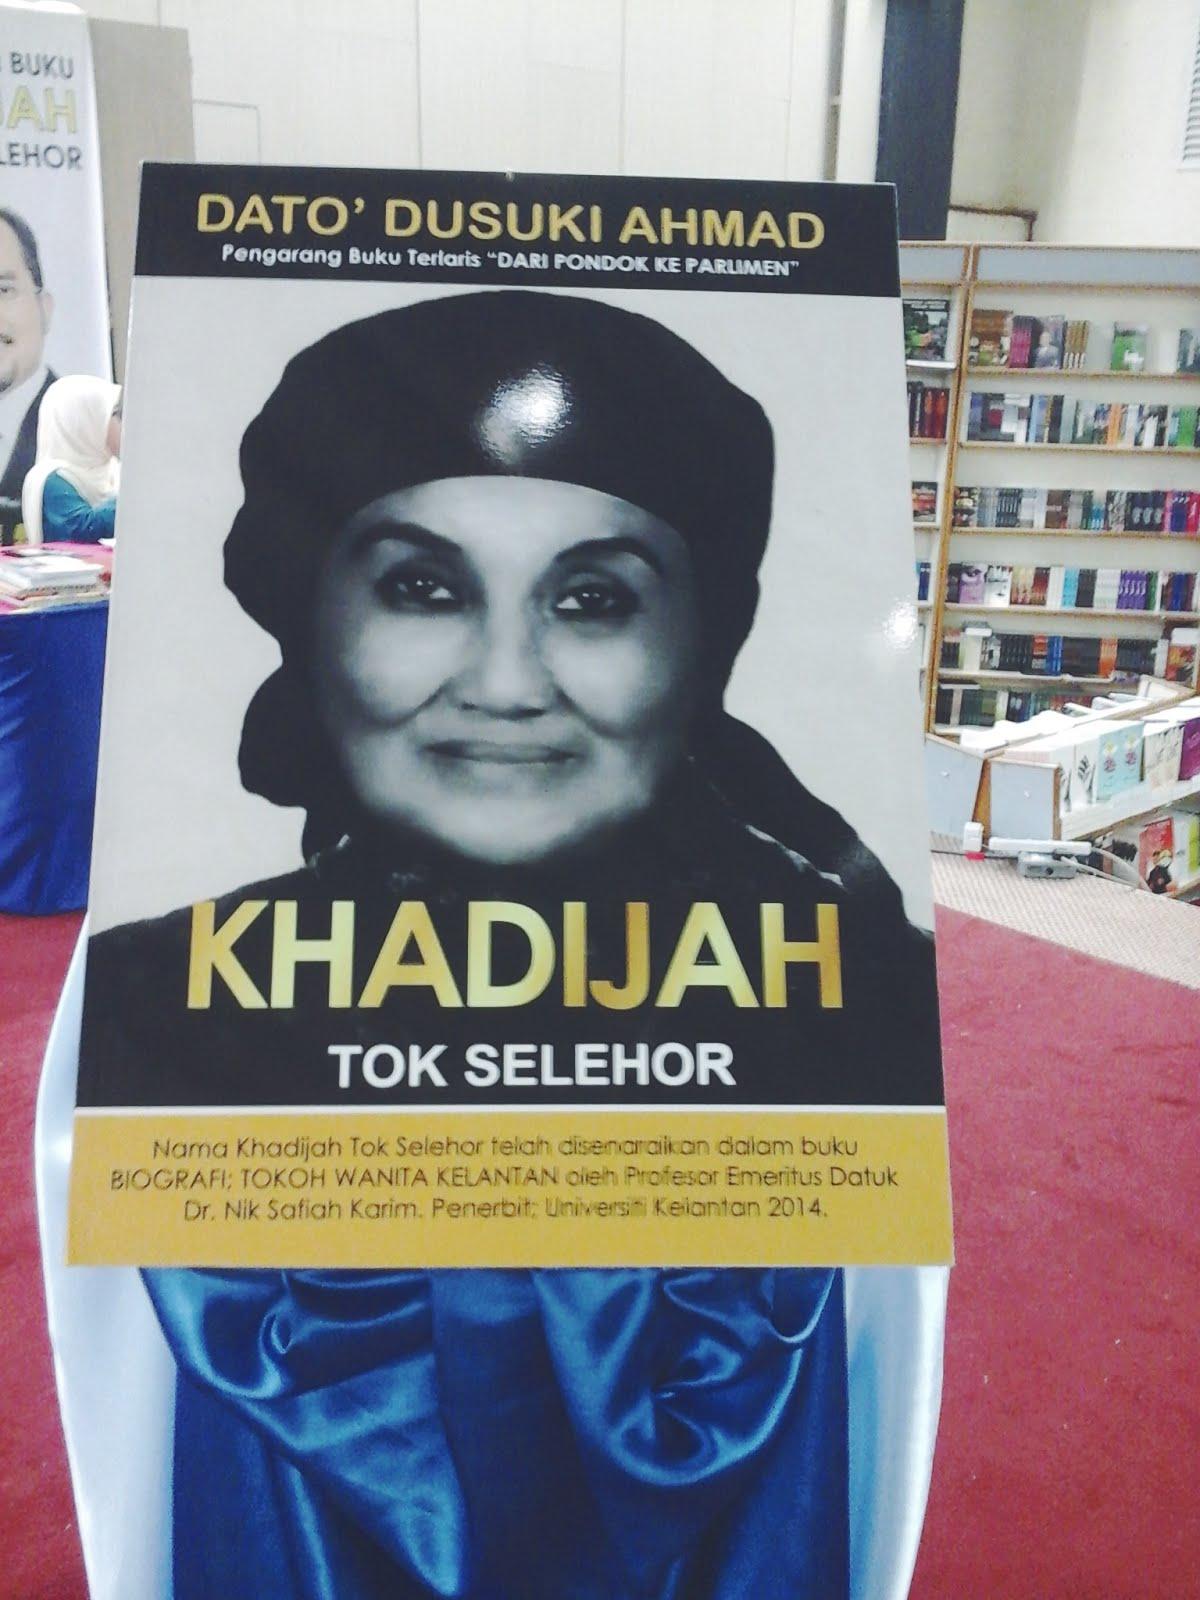 Beli Buku Khadijah Tok Selehor